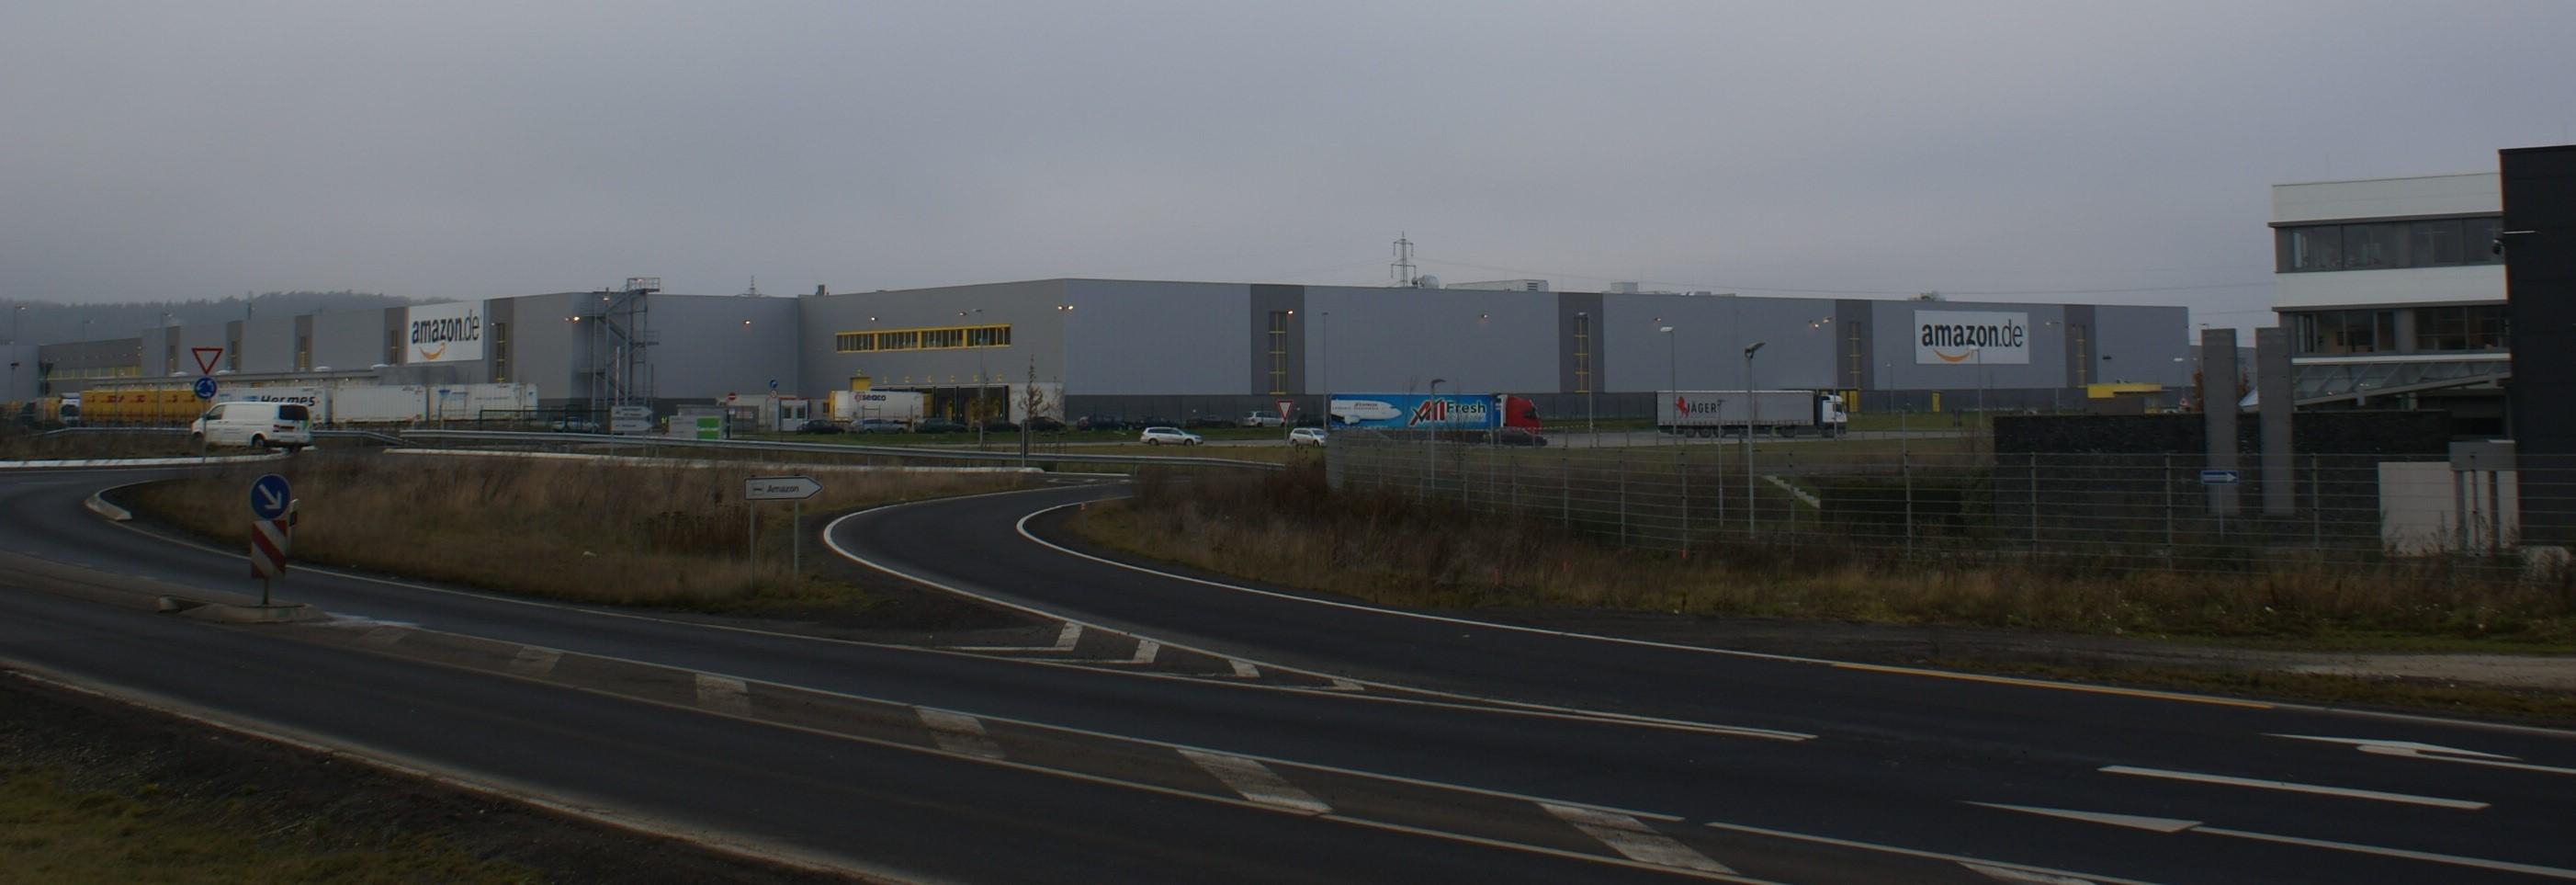 Industriepark A61